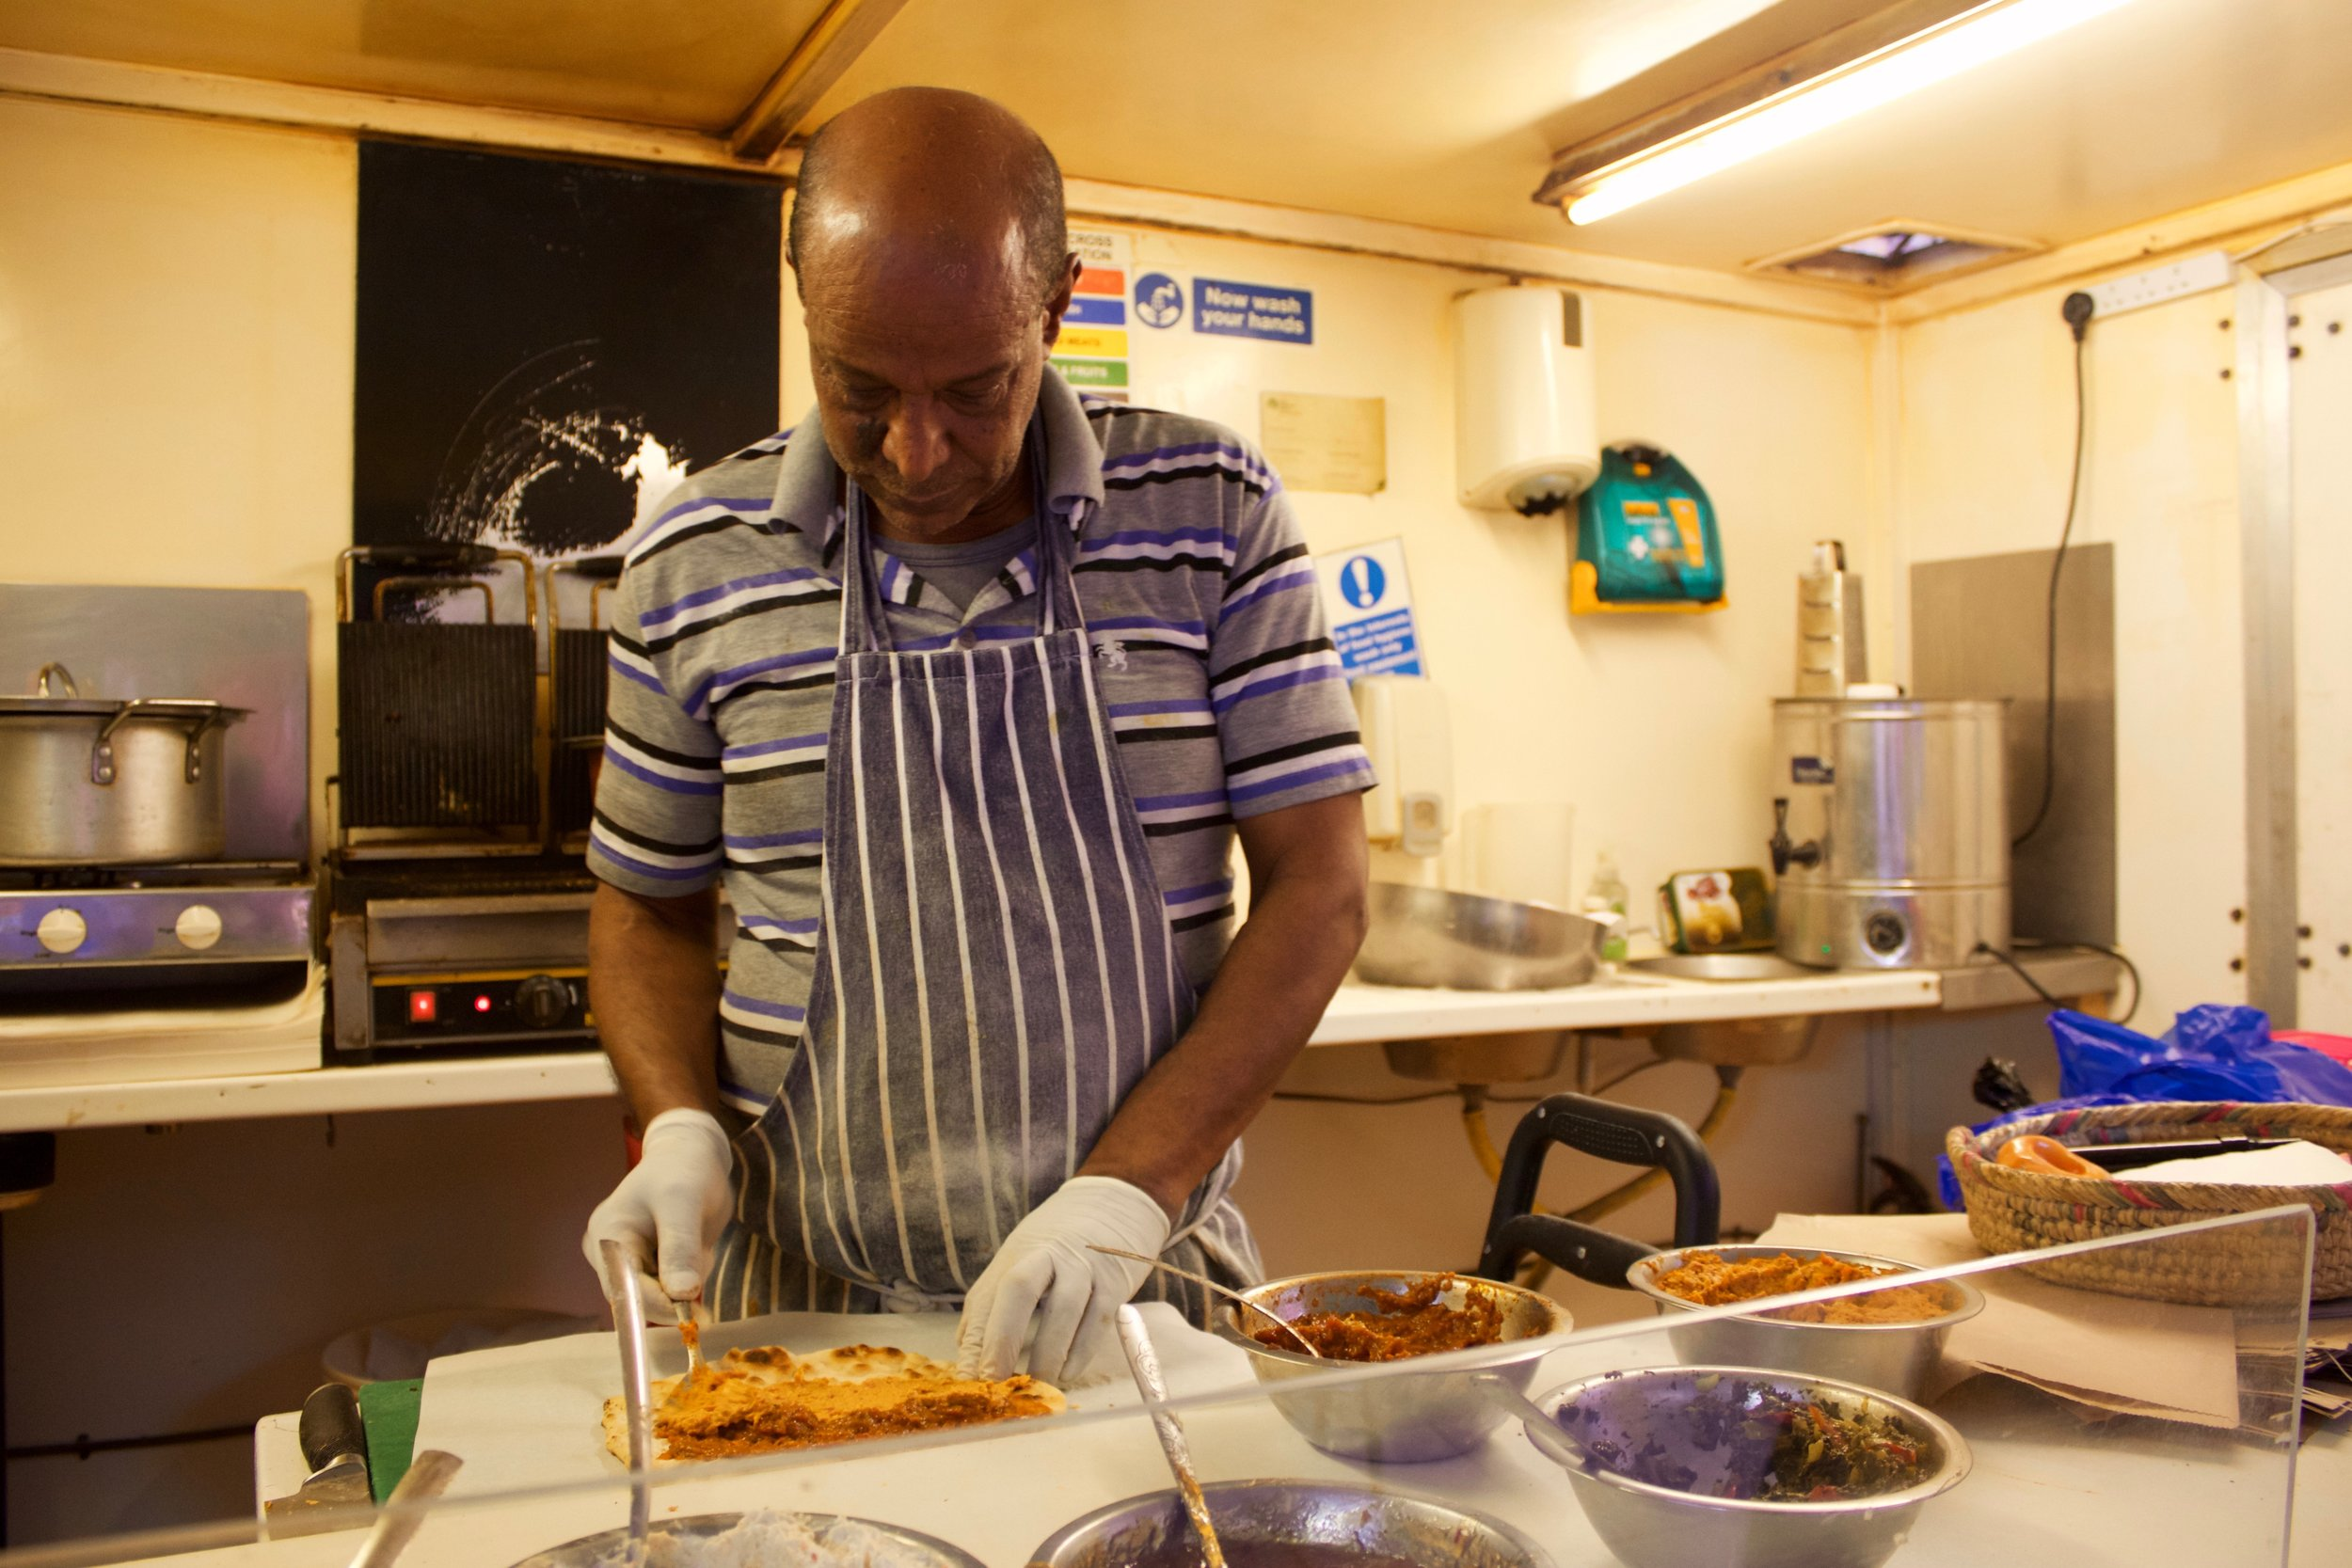 Salas Peckham Food Truck